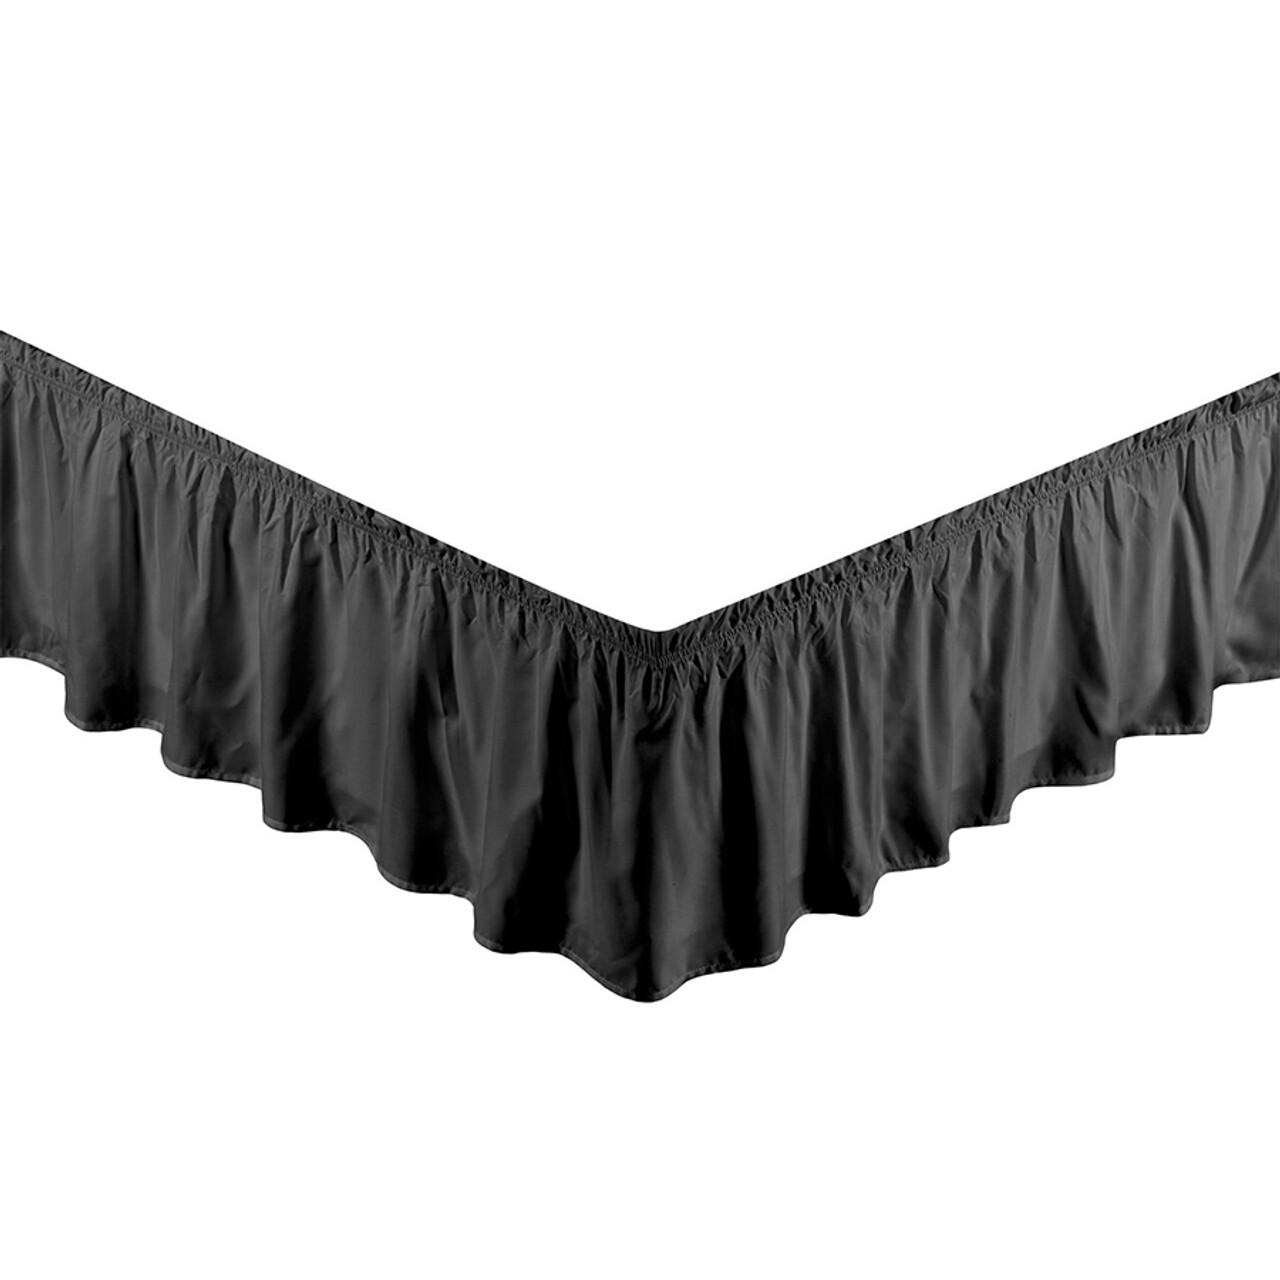 "Black Bed Skirt Dust Ruffle 100% Brushed Microfiber with 14"" Drop in USA, California, New York, New York City, Los Angeles, San Francisco, Pennsylvania, Washington DC, Virginia, Maryland"